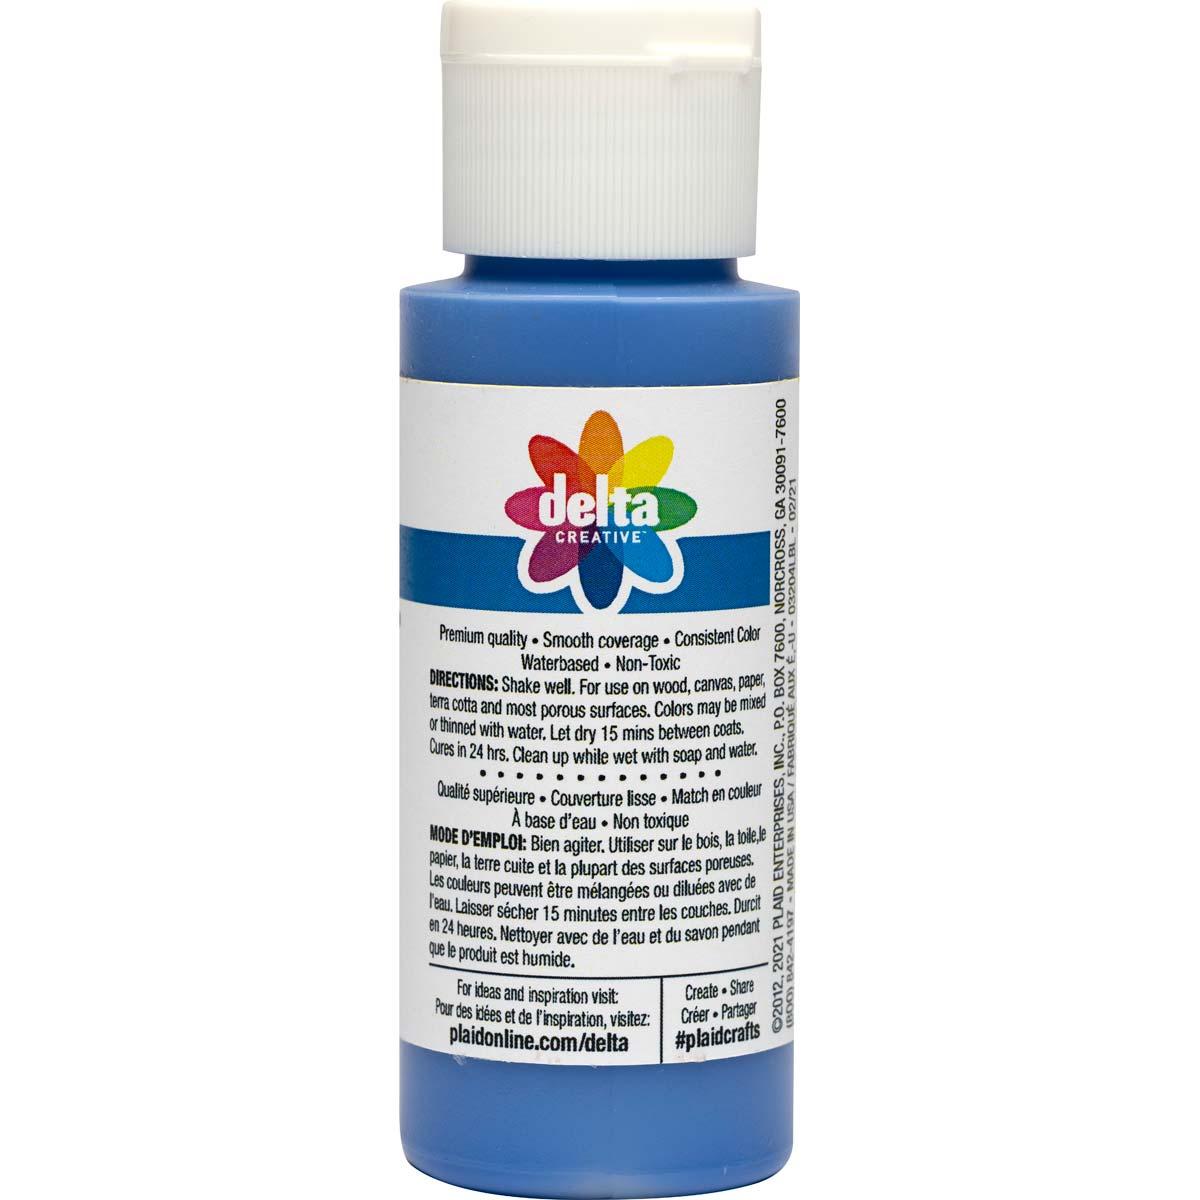 Delta Ceramcoat Acrylic Paint - Blue Beauty, 2 oz. - 03204